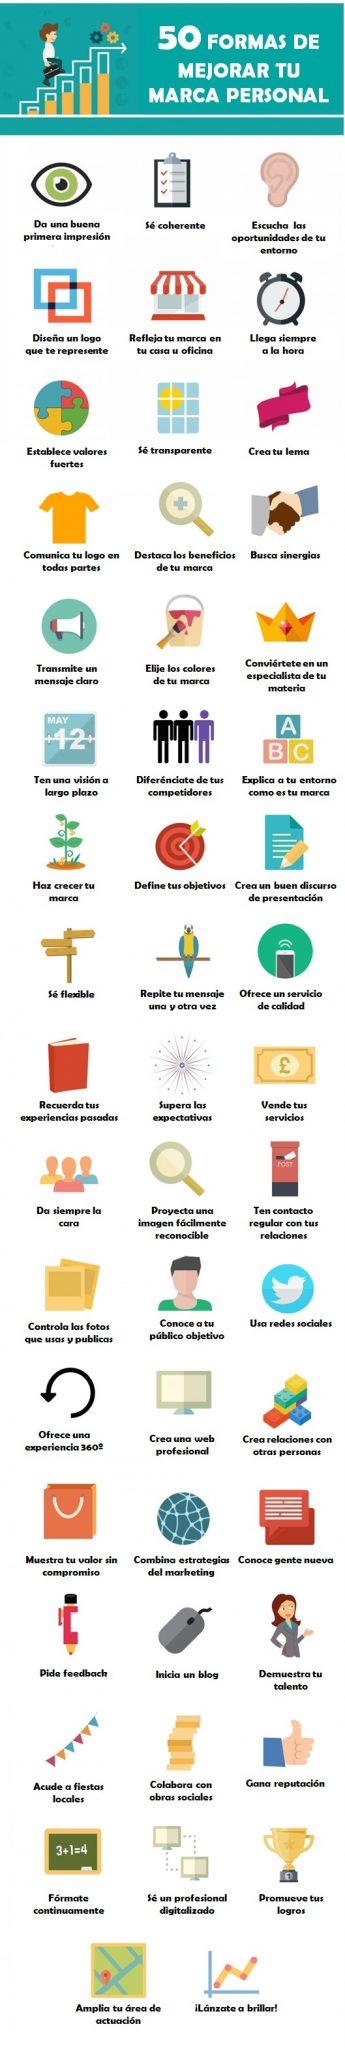 50-formas-mejorar-marca-personal-infografia